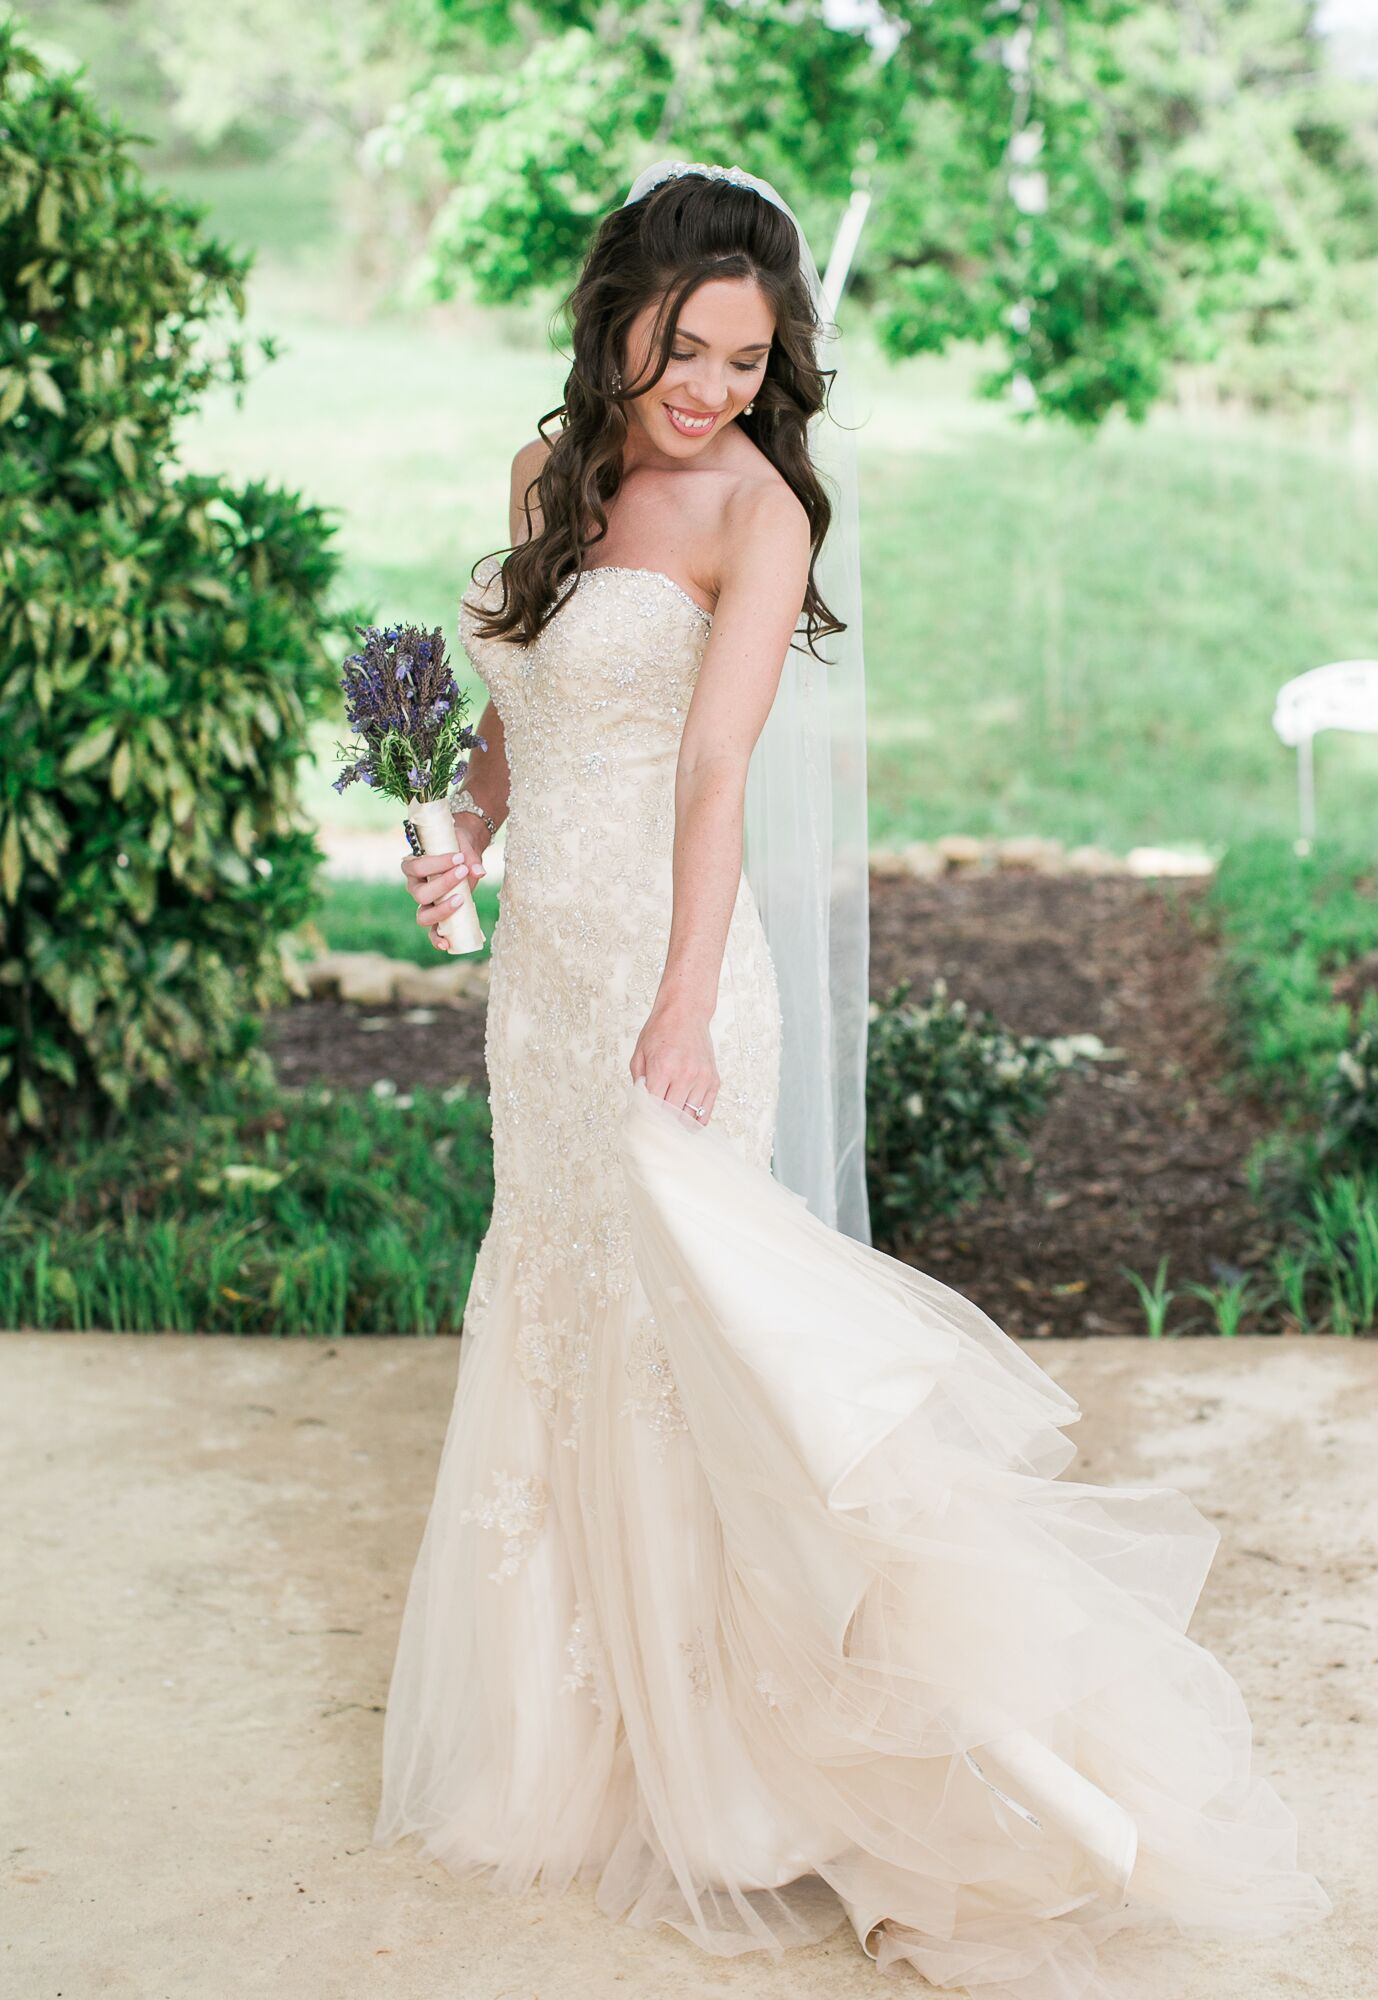 Champagne Colored Wedding Dress Stella York